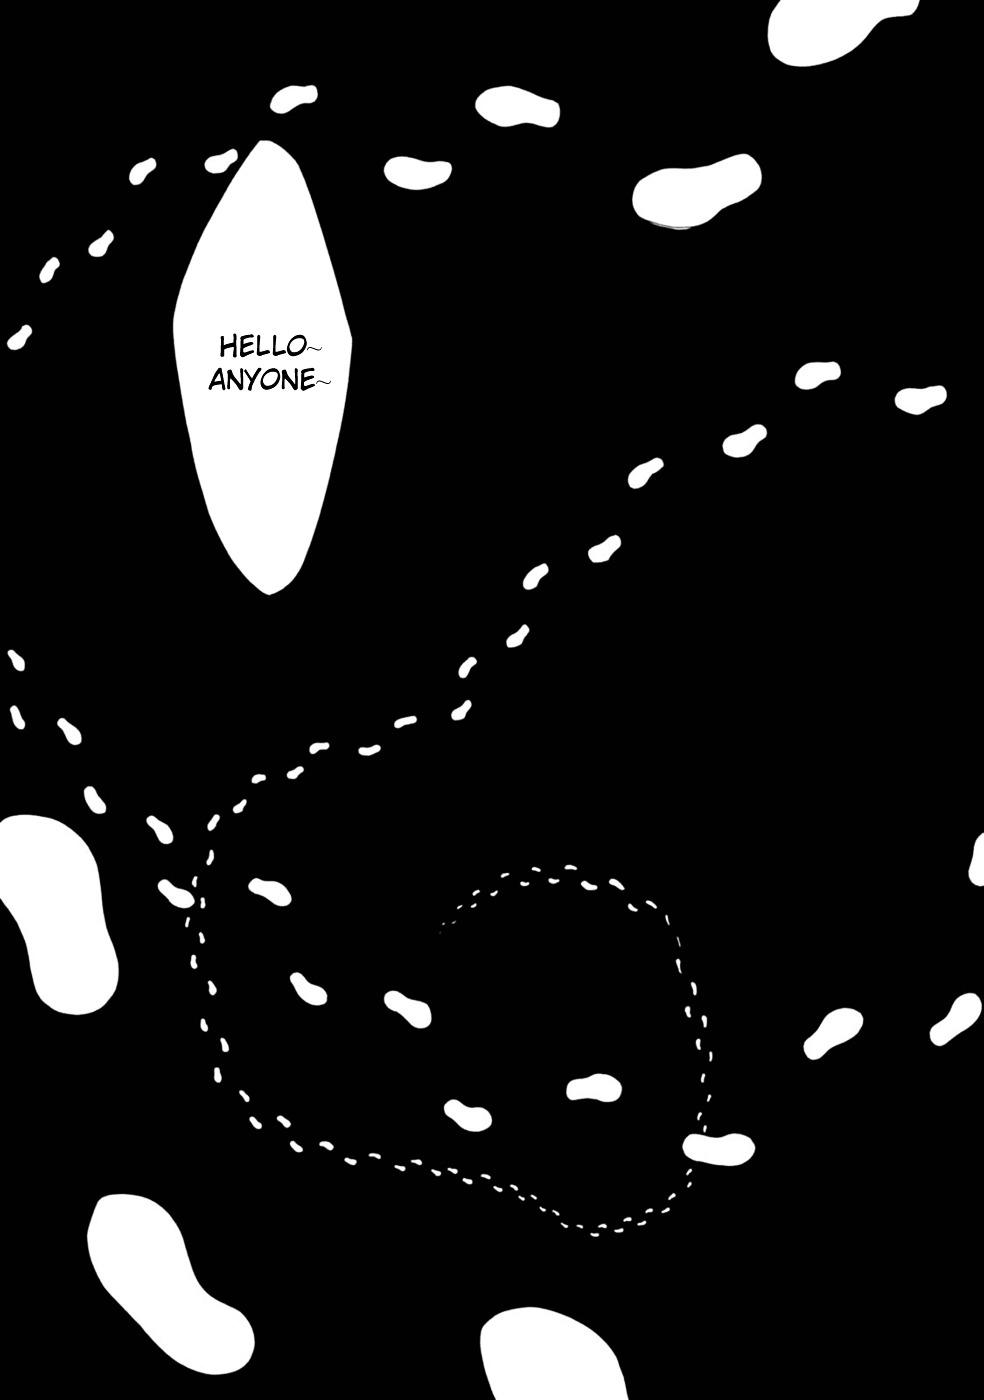 Mushoku Tensei: Jobless Reincarnation, Mushoku Tensei - Nouvelle vie, nouvelle chance, Mushoku Tensei: If I Get to a Parallel Universe I'll Bring Out my True Effort, Mushoku Tensei, Mushoku Tensei manga, Mushoku Tensei: Isekai Ittara Honki Dasu, Mushoku Tensei: Isekai Ittara Honki Dasu manga, mushoku tensei isekai ittara honki dasu episode 2 english sub, mushoku tensei isekai ittara honki dasu episode 1 english sub, mushoku tensei isekai ittara honki dasu ep 3, mushoku tensei episode 3 release date, mushoku tensei rudeus, mushoku tensei characters, mushoku tensei mal, mushoku tensei how many episodes, mushoku tensei light novel, mushoku tensei wiki, mushoku tensei ep 2, mushoku tensei crunchyroll, mushoku tensei ep 3, roxy migurdia, mushoku tensei sub indo, mushoku tensei reddit, mushoku tensei netflix, sylphiette, future rudeus, mushoku tensei volume 1 illustrations, studio bind, mushoku tensei isekai ittara honki dasu, mushoku tensei episode 1, mushoku tensei novel, mushoku tensei manga volume 1, mushoku tensei anime episode 1, mushoku tensei volume 23, mushoku tensei episode 1 sub indo, mushoku tensei amazon, mushoku tensei vietsub, mushoku tensei: jobless reincarnation vostfr, mushoku tensei isekai ittara honki dasu ep 2, mushoku tensei isekai ittara honki dasu streaming, download anime mushoku tensei isekai ittara honki dasu, A Reencarnação do Vagabundo: Vou dar meu melhor se for para outro mundo, Jobless Reincarnation - I Will Go All Out When I'm Transported to Another World, Jobless Reincarnation - It Will be All Out if I Go to Another World, Mr. No-Job's New Life - If I Go to a Parallel World, Then I'll Get Serious, Реинкарнация безработного ~История о приключениях в другом мире~, Pеинкарнация безработного: Попав в другой мир, я стану сёръёзнее, เกิดชาตินี้พี่ต้องเทพ, 无职转生, 무직전생 〜다른 세계 가면 진심 낸다〜,